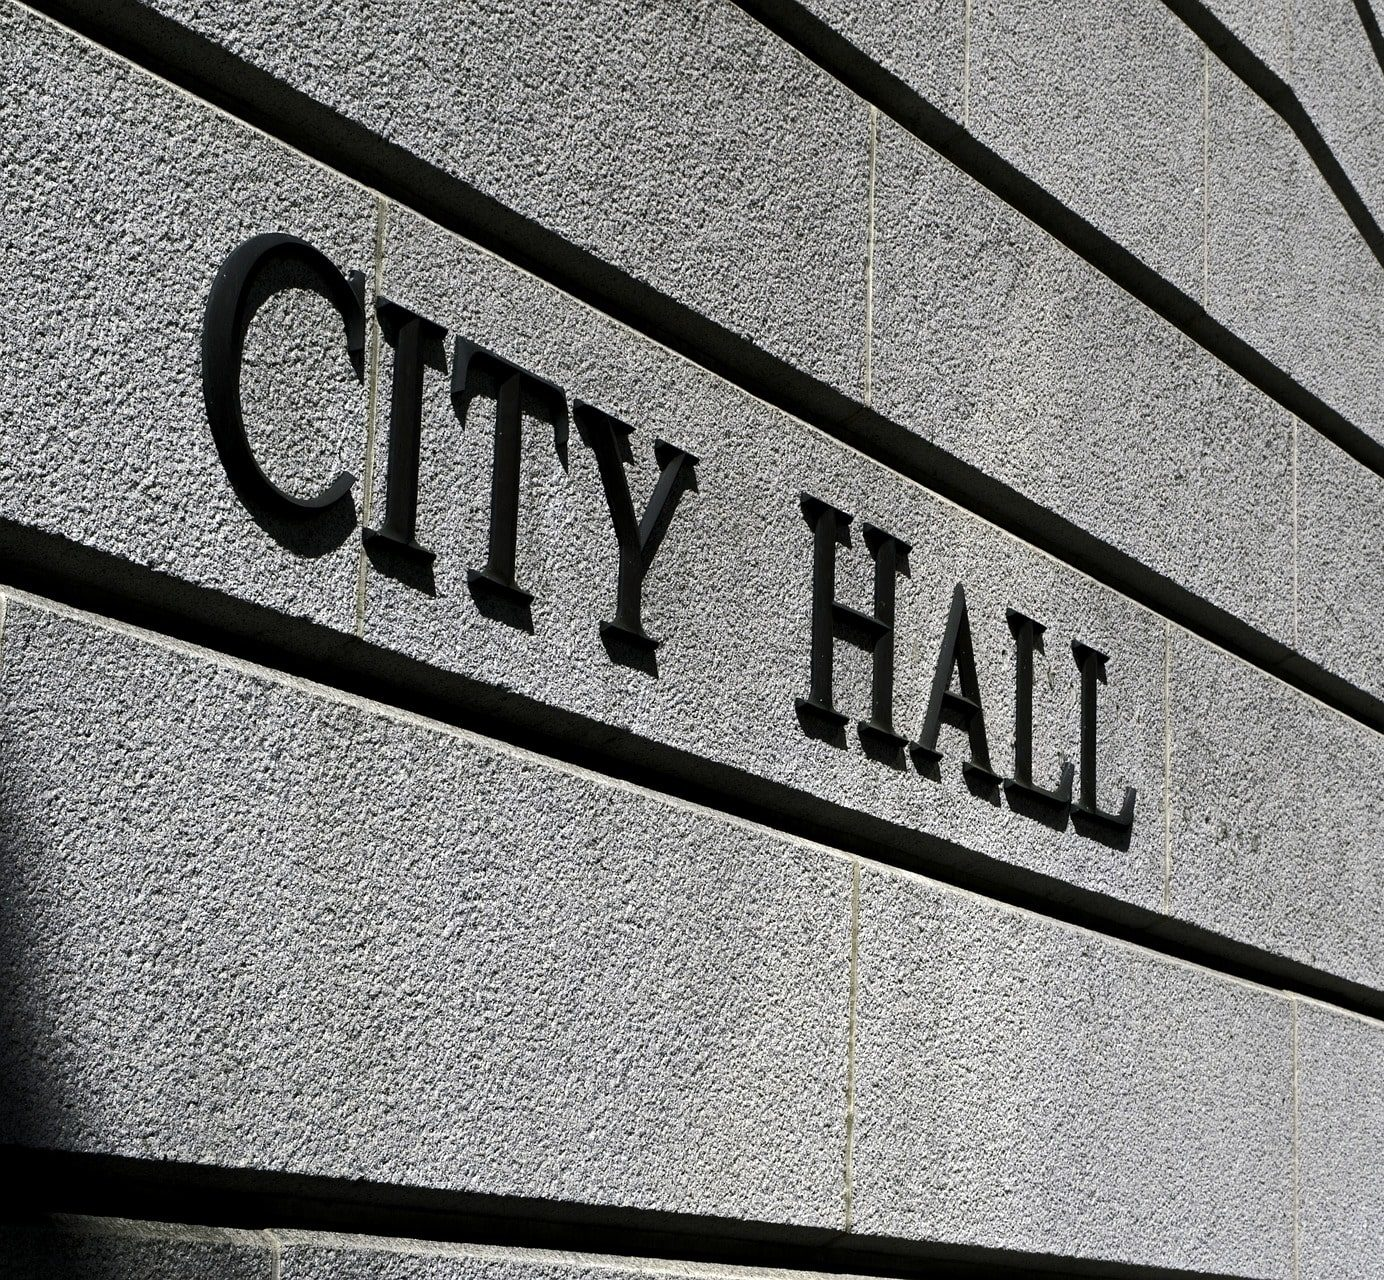 Municipal Inspections